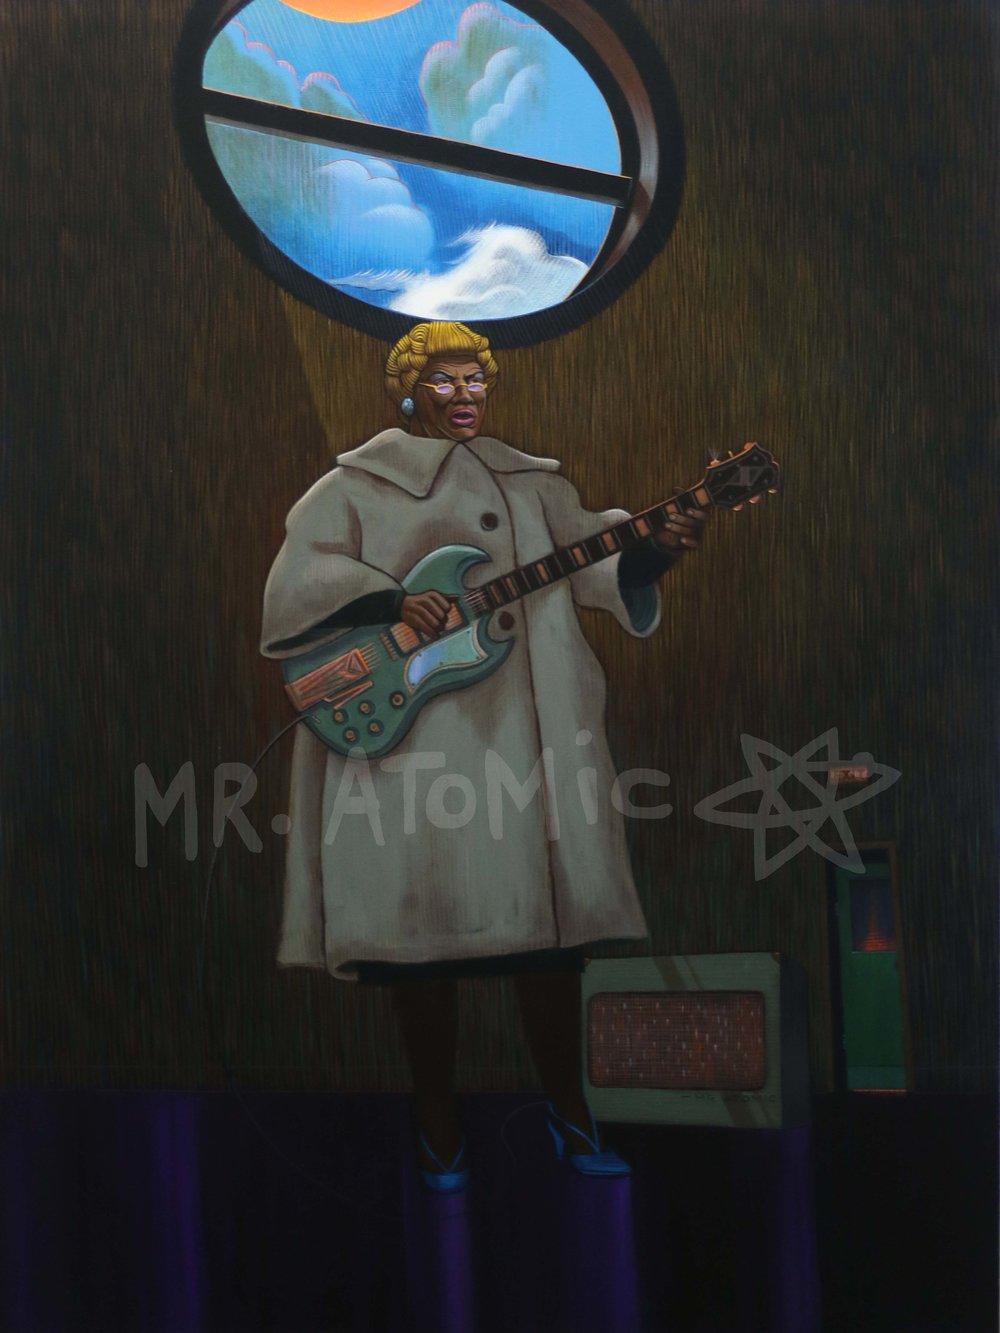 Blues Mama on Fire (Sister Rosetta Tharpe) - 3'x4'